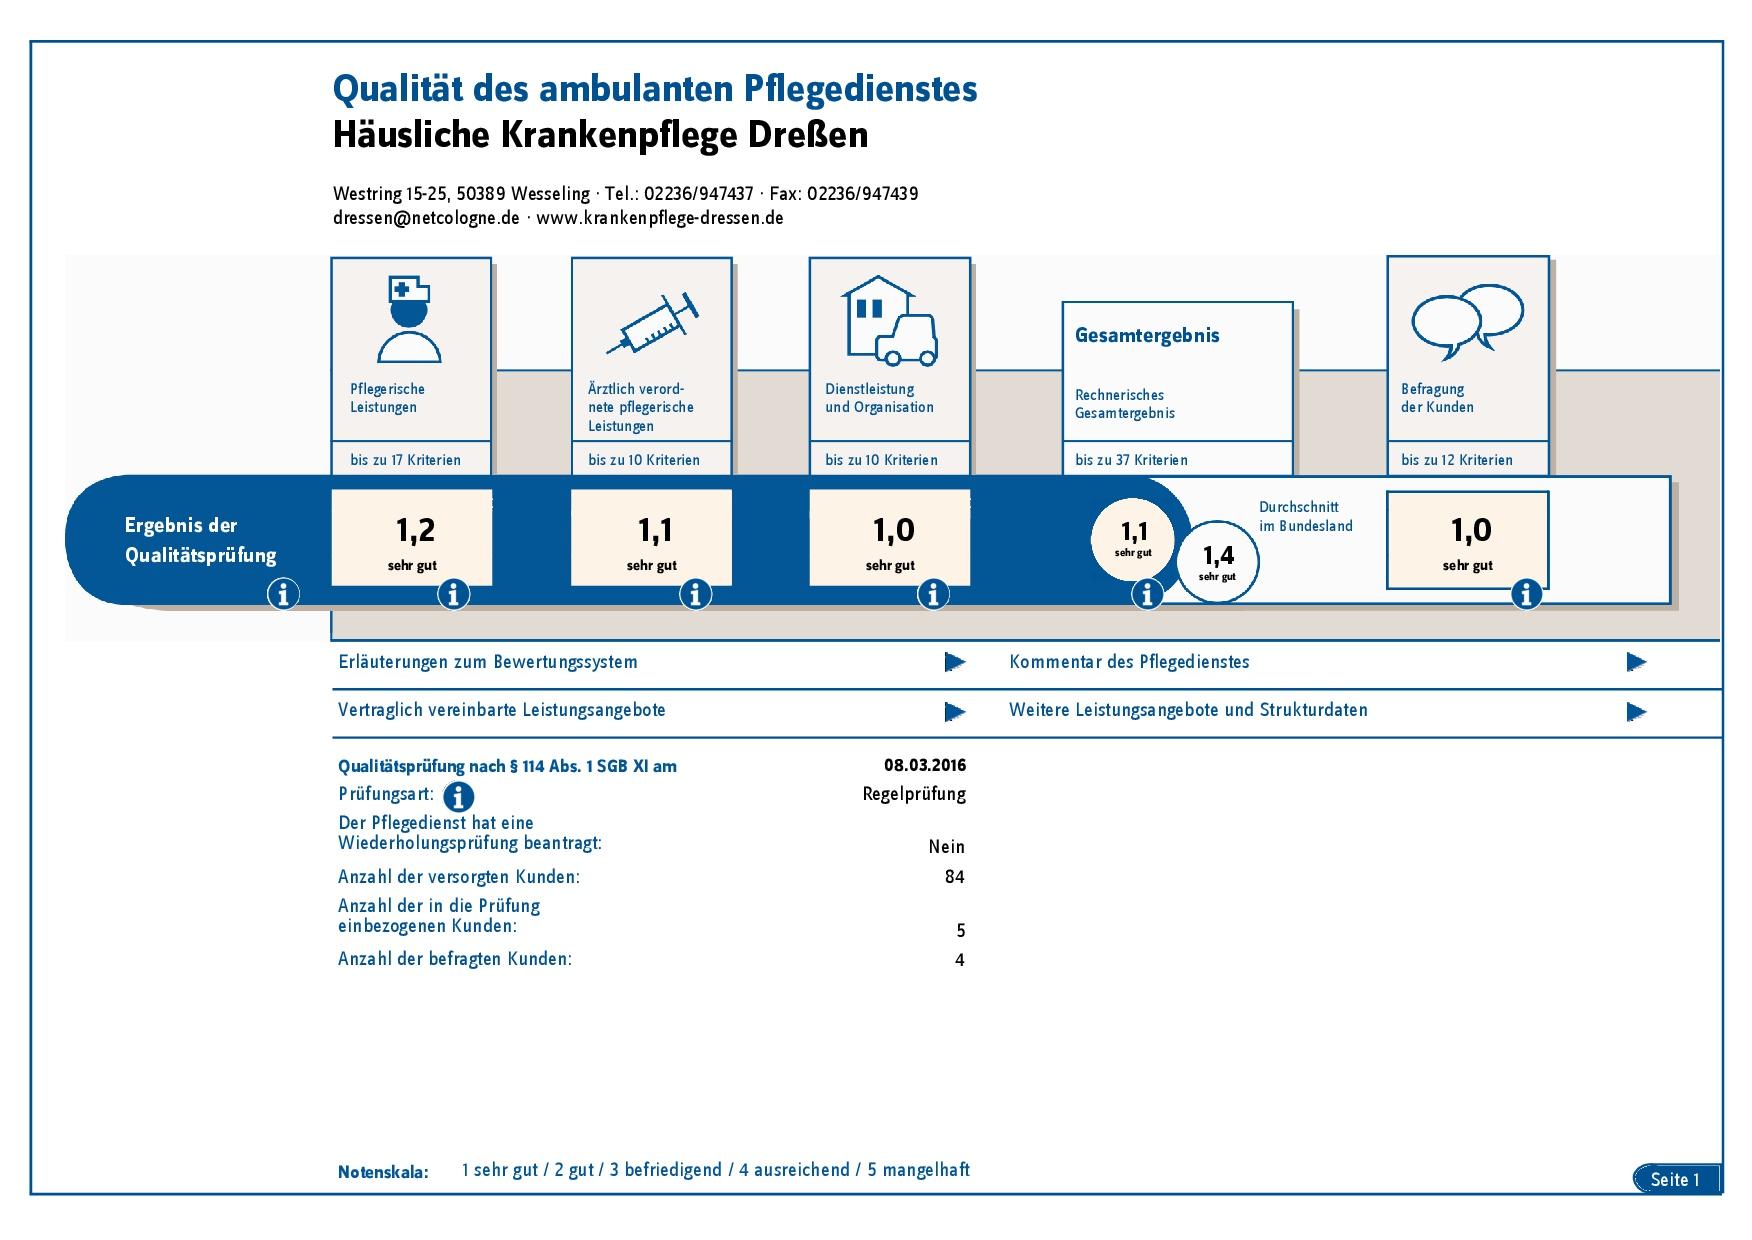 Transparentbericht 2016